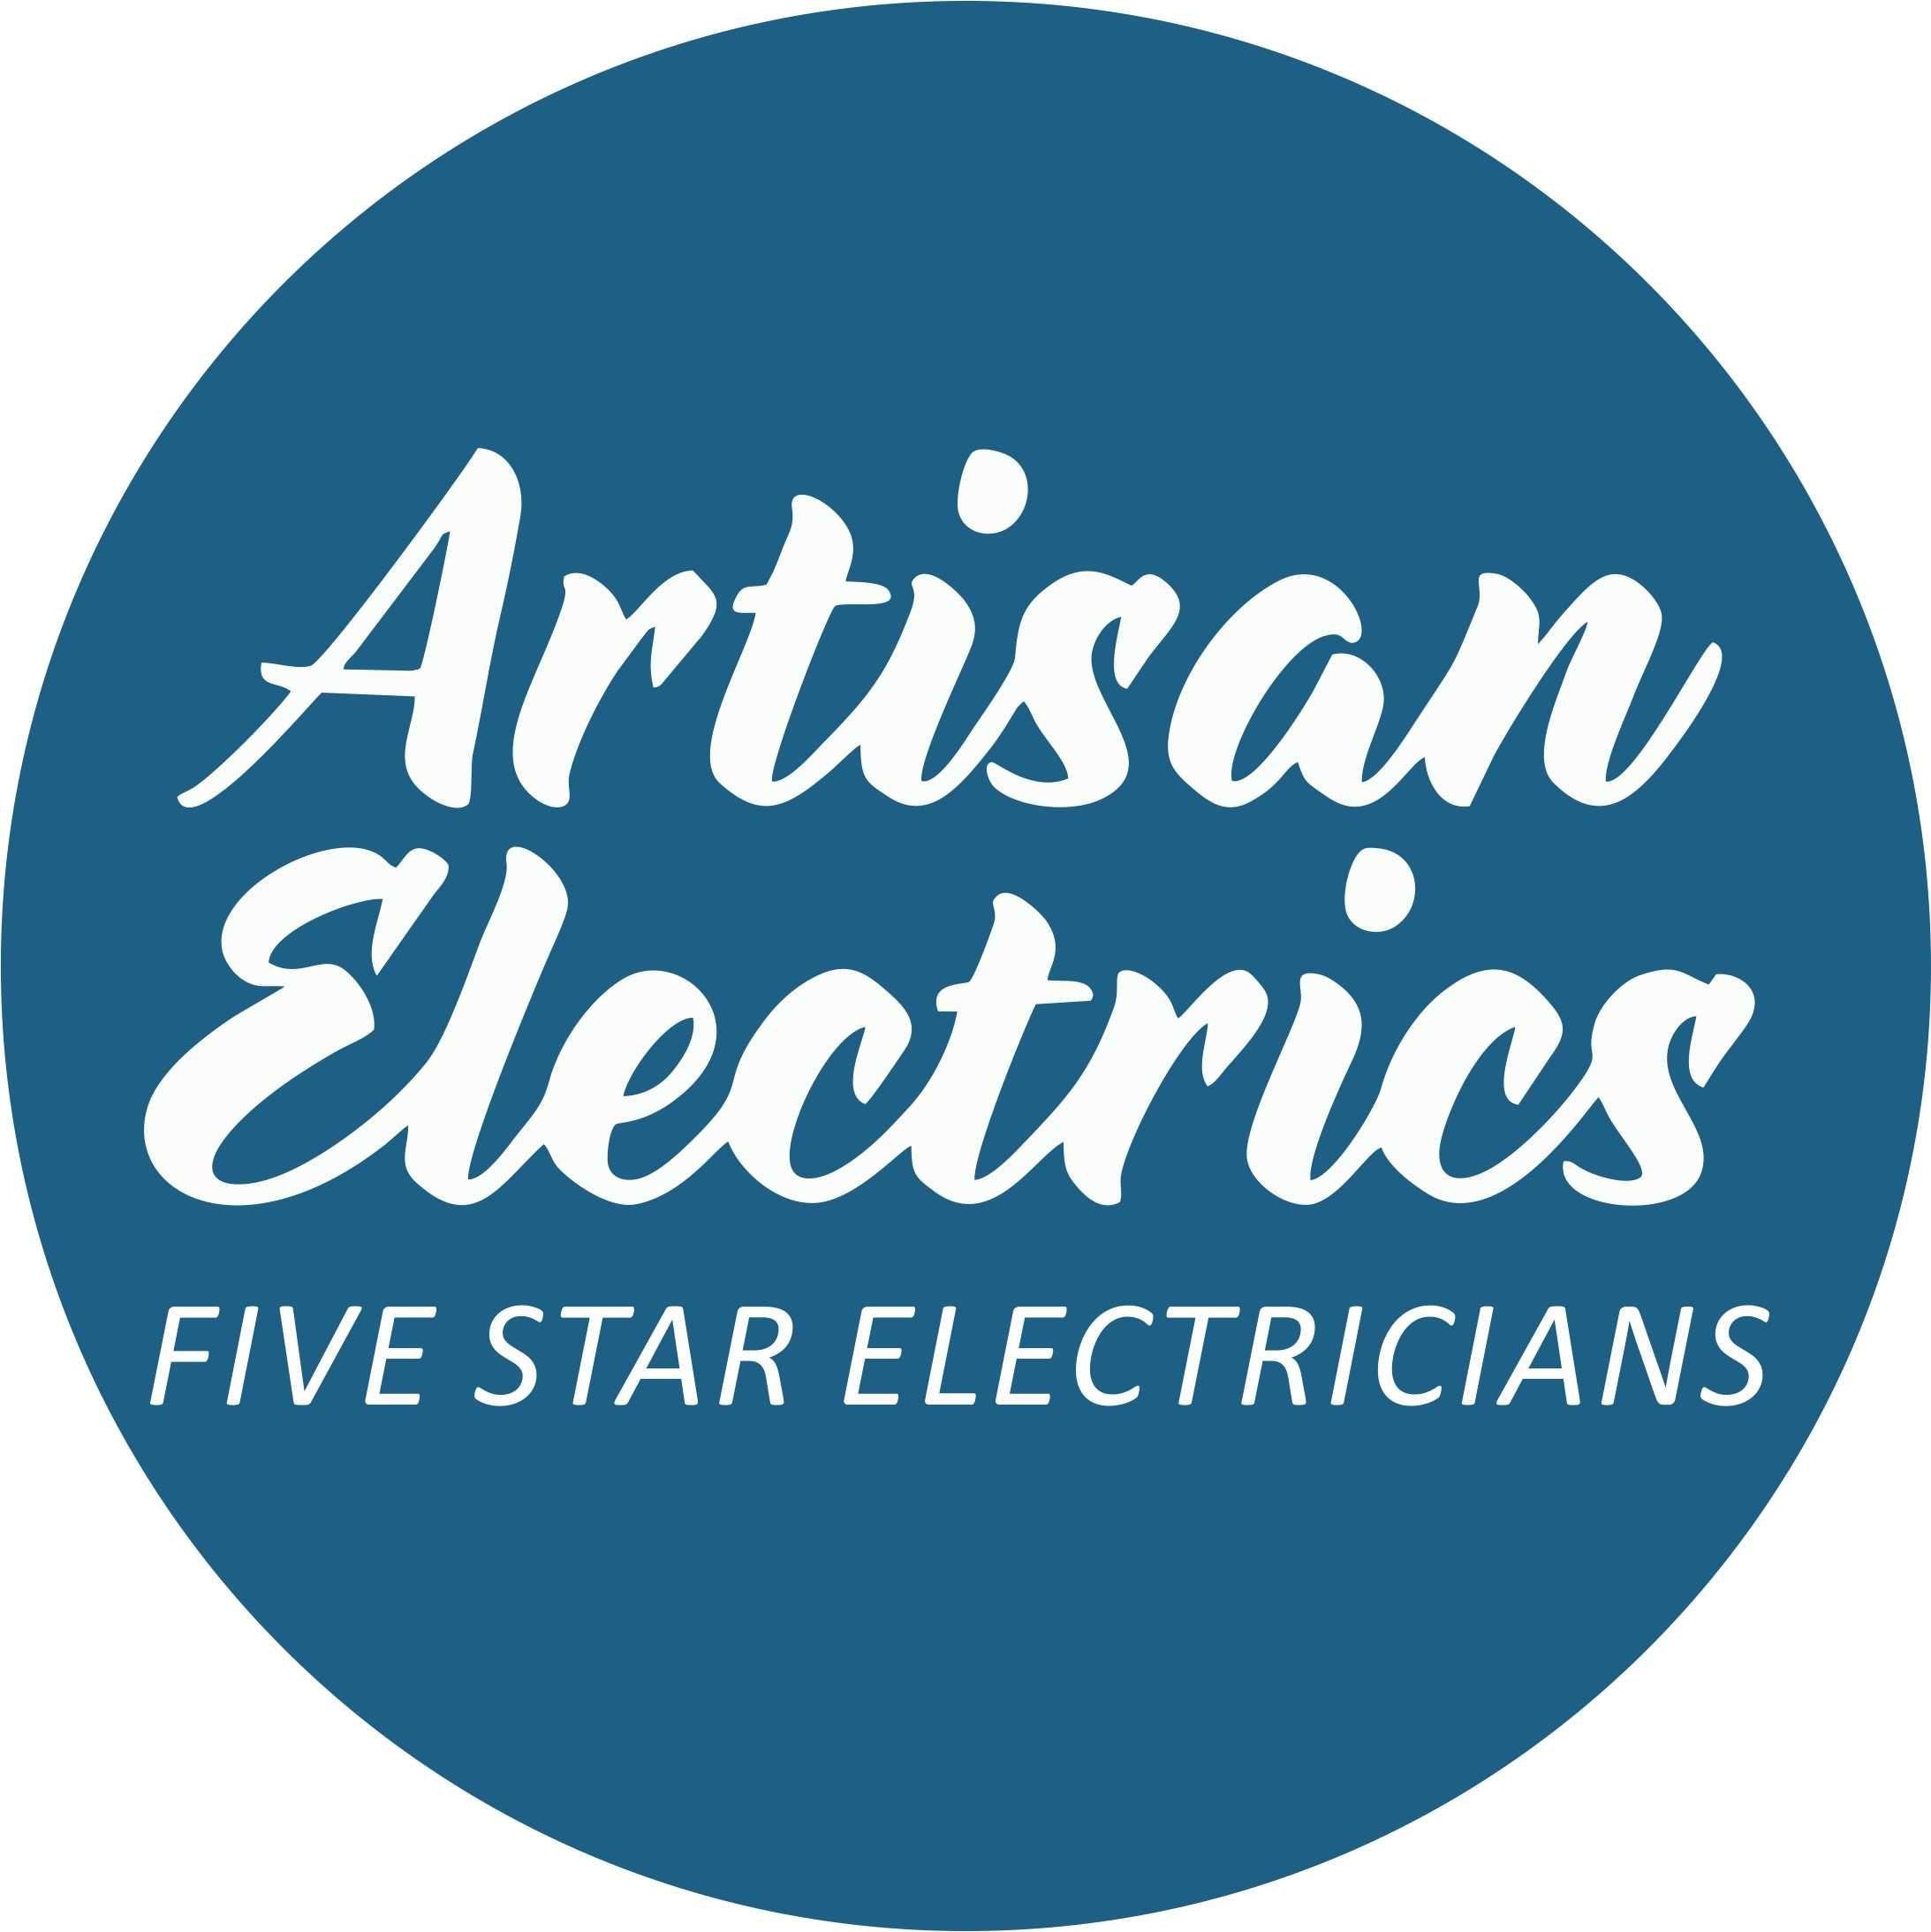 Jordan Farley- Artisan Electrics (Cambridge) Ltd